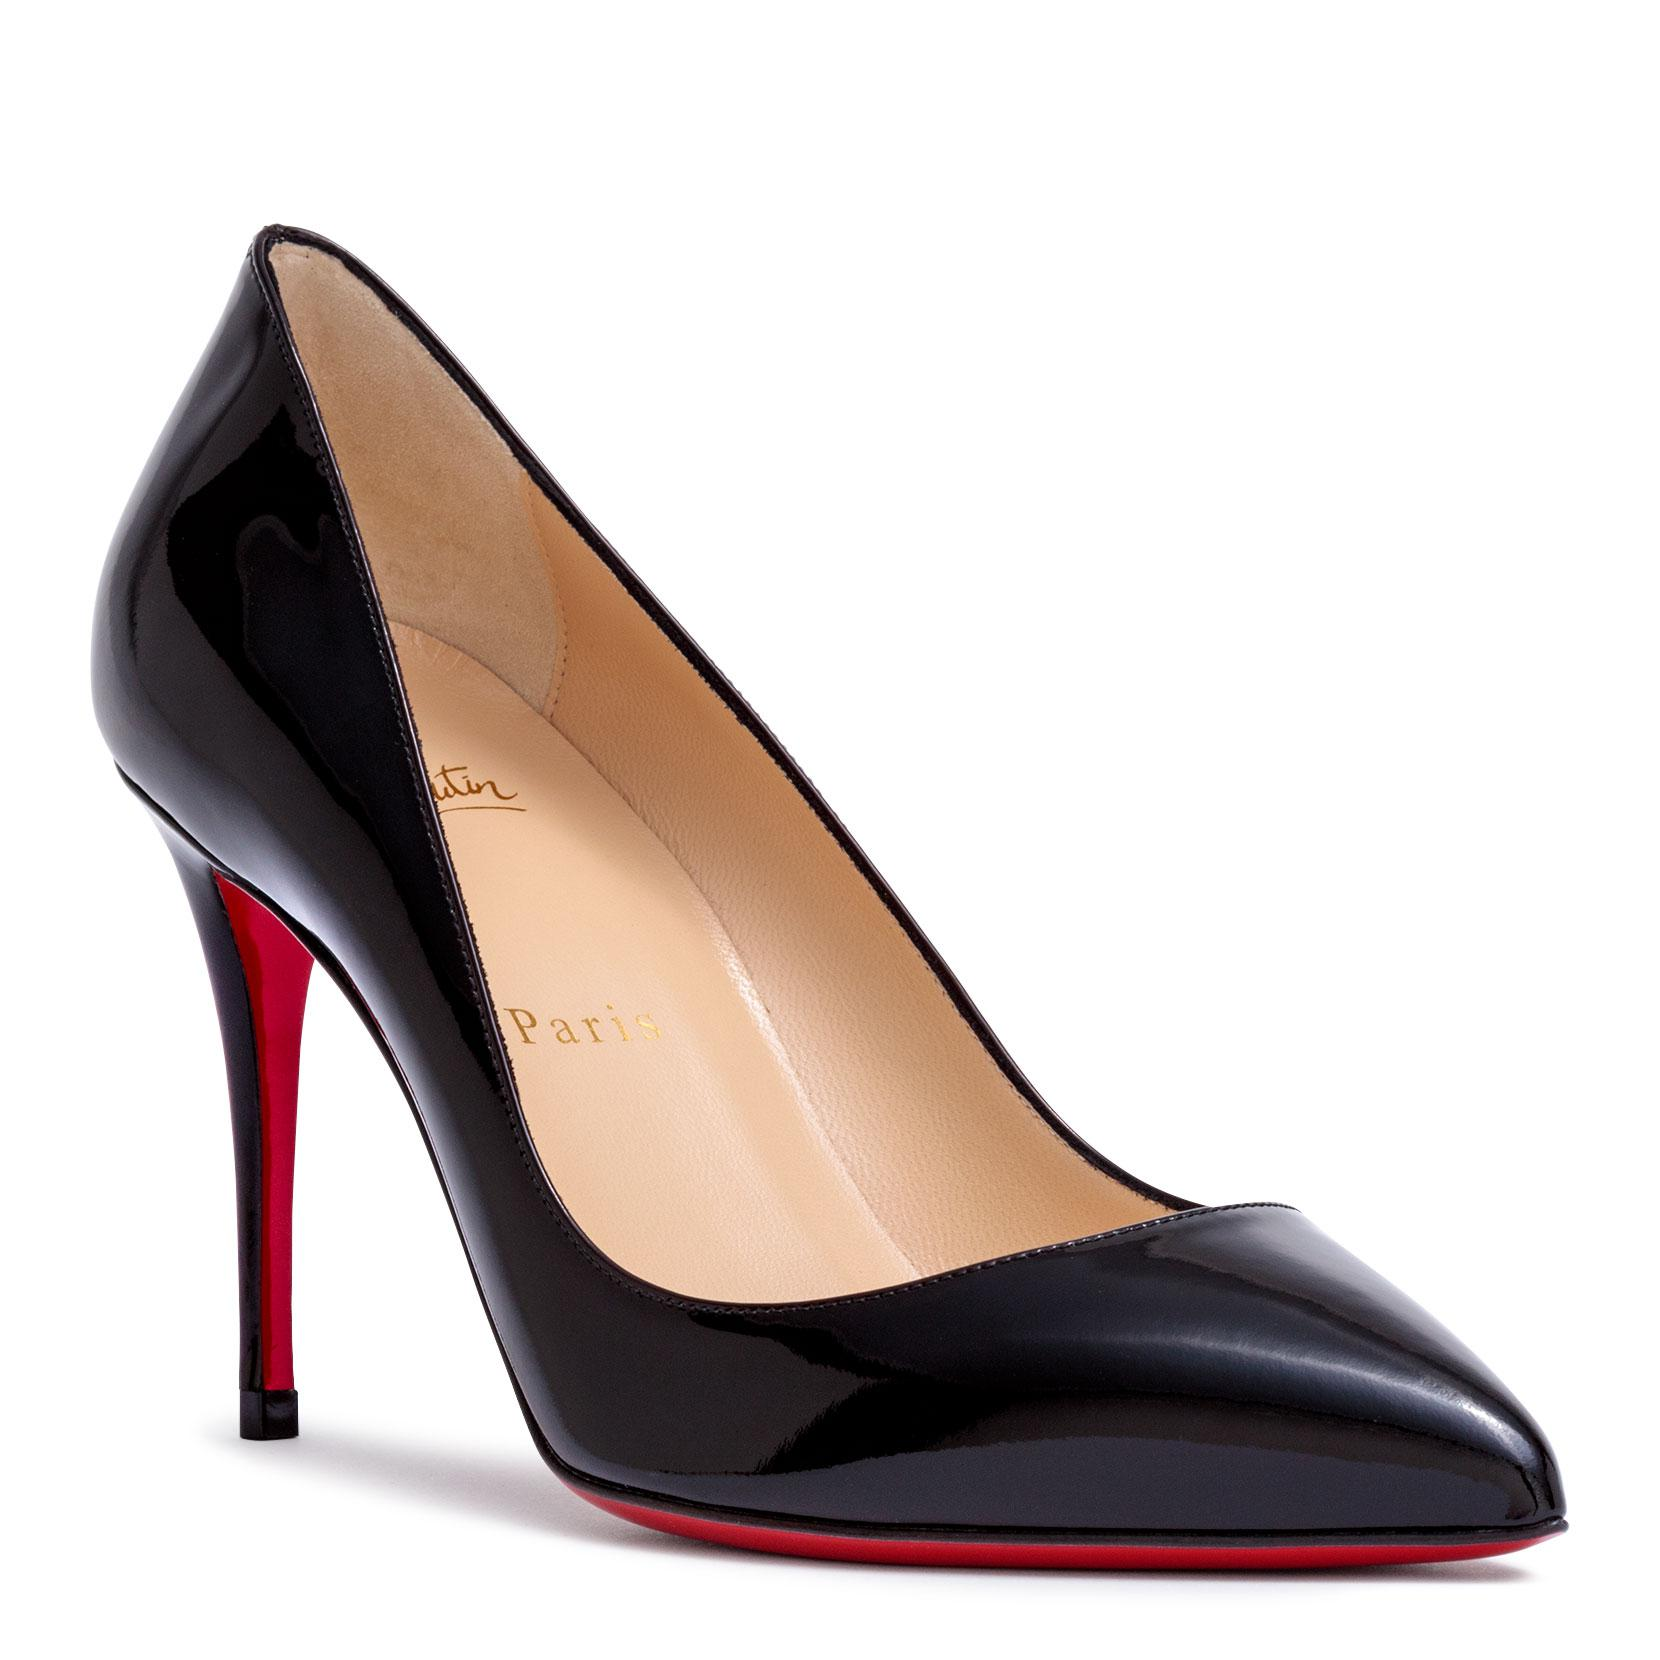 Pigalle Follies 85 black patent leather pumps Christian Louboutin Af72qy7xS6